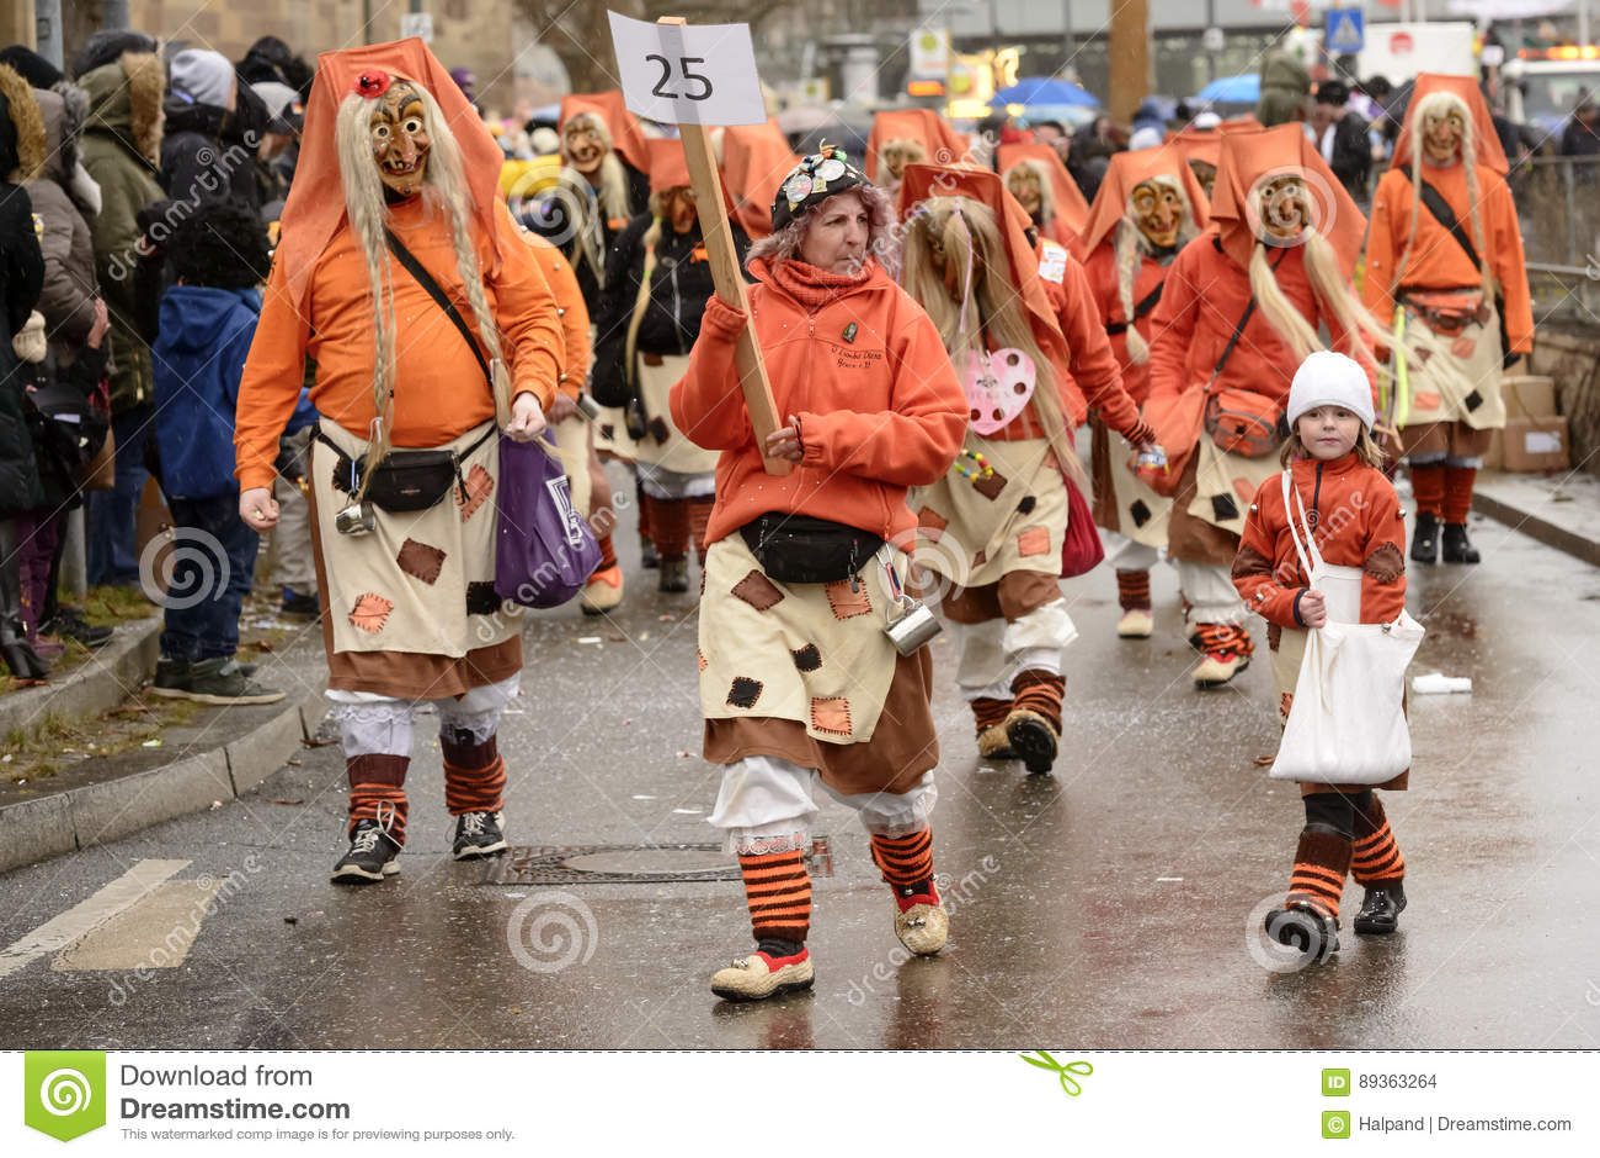 halloween events stuttgart 2017